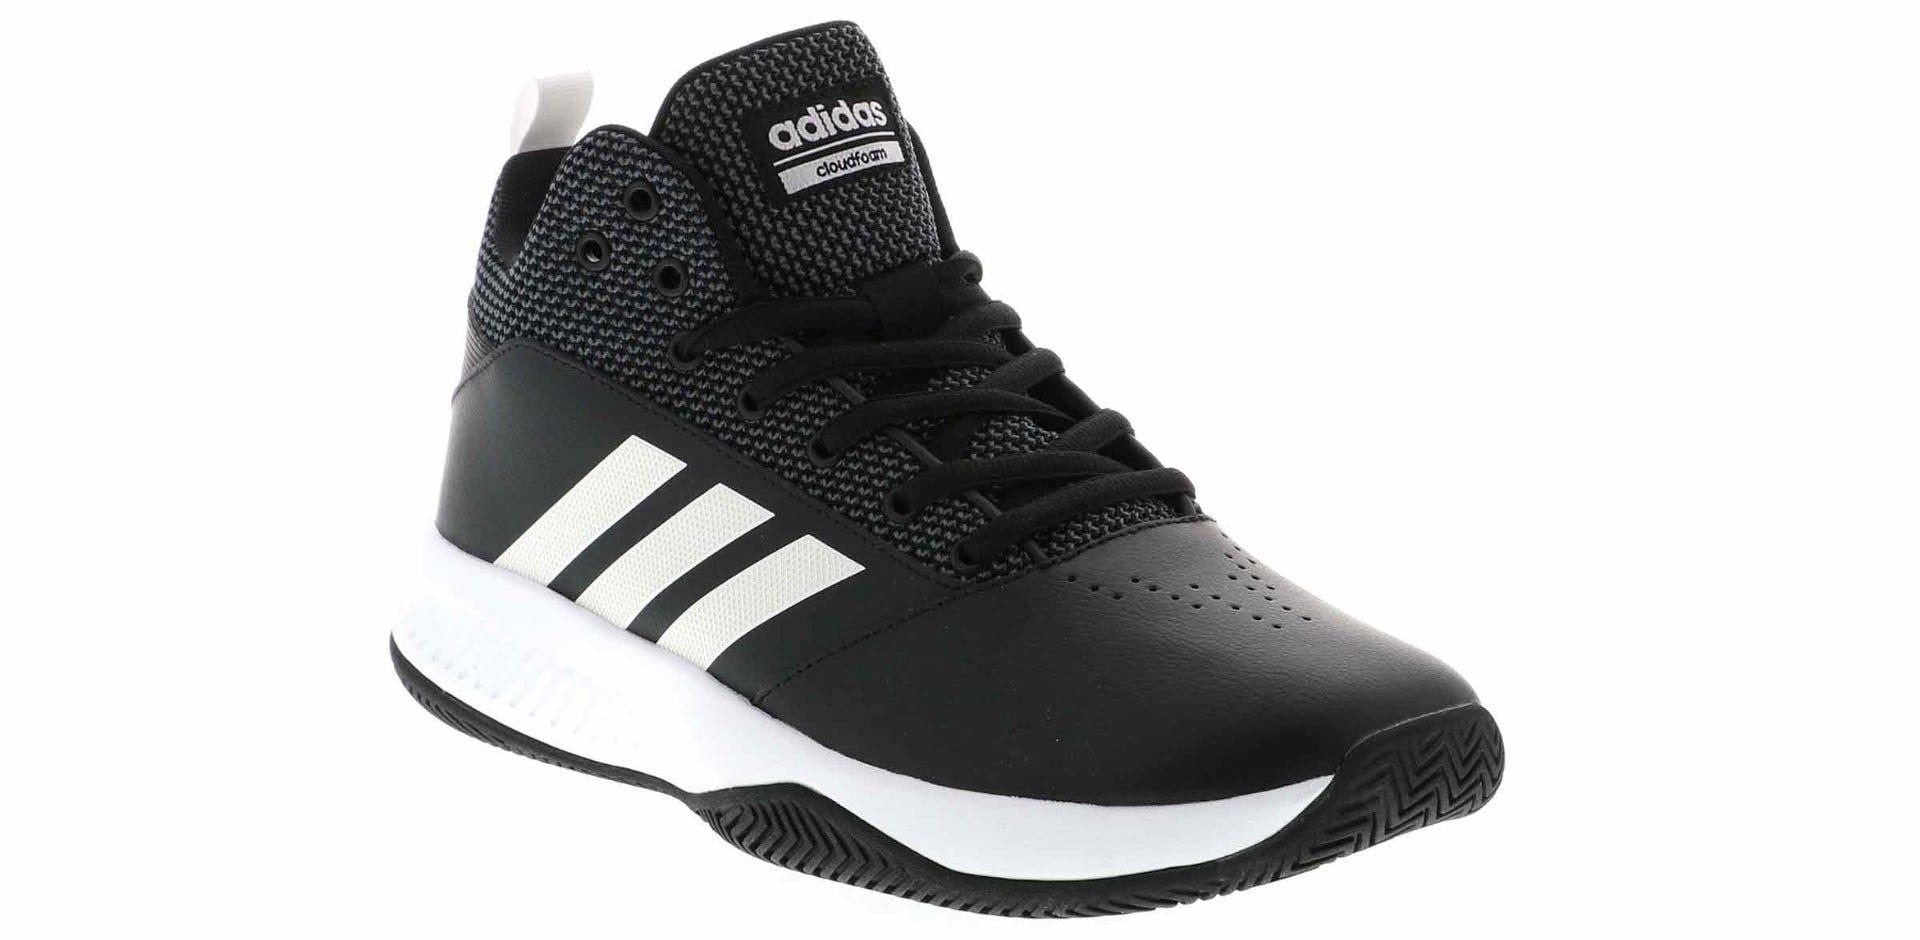 Adidas Cloudfoam Ilation Mid Herren Schwarz Basketball